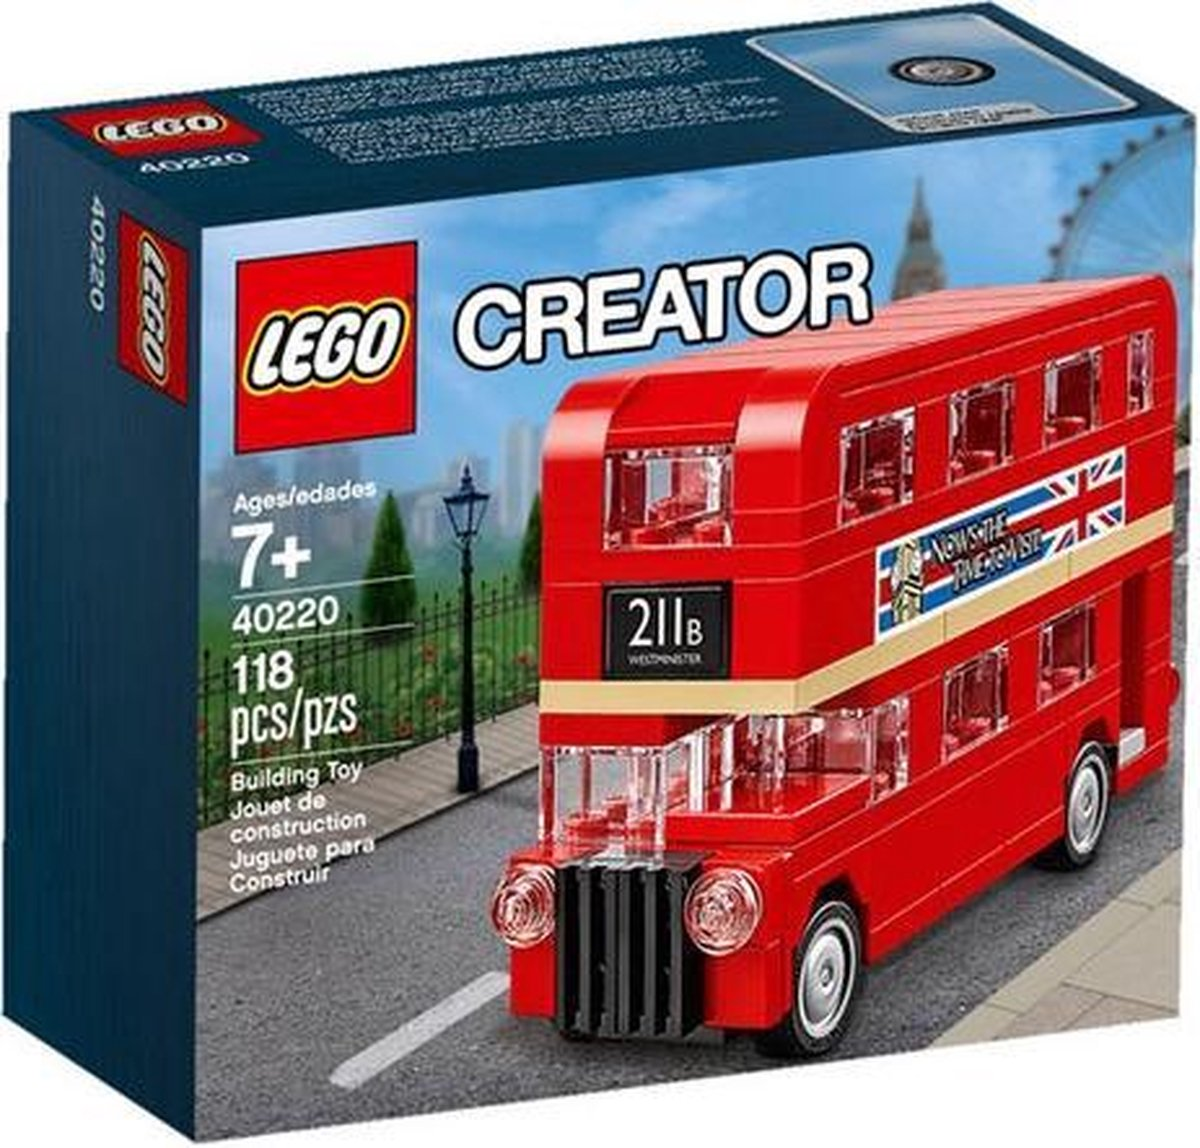 LEGO Creator London Bus - 40220